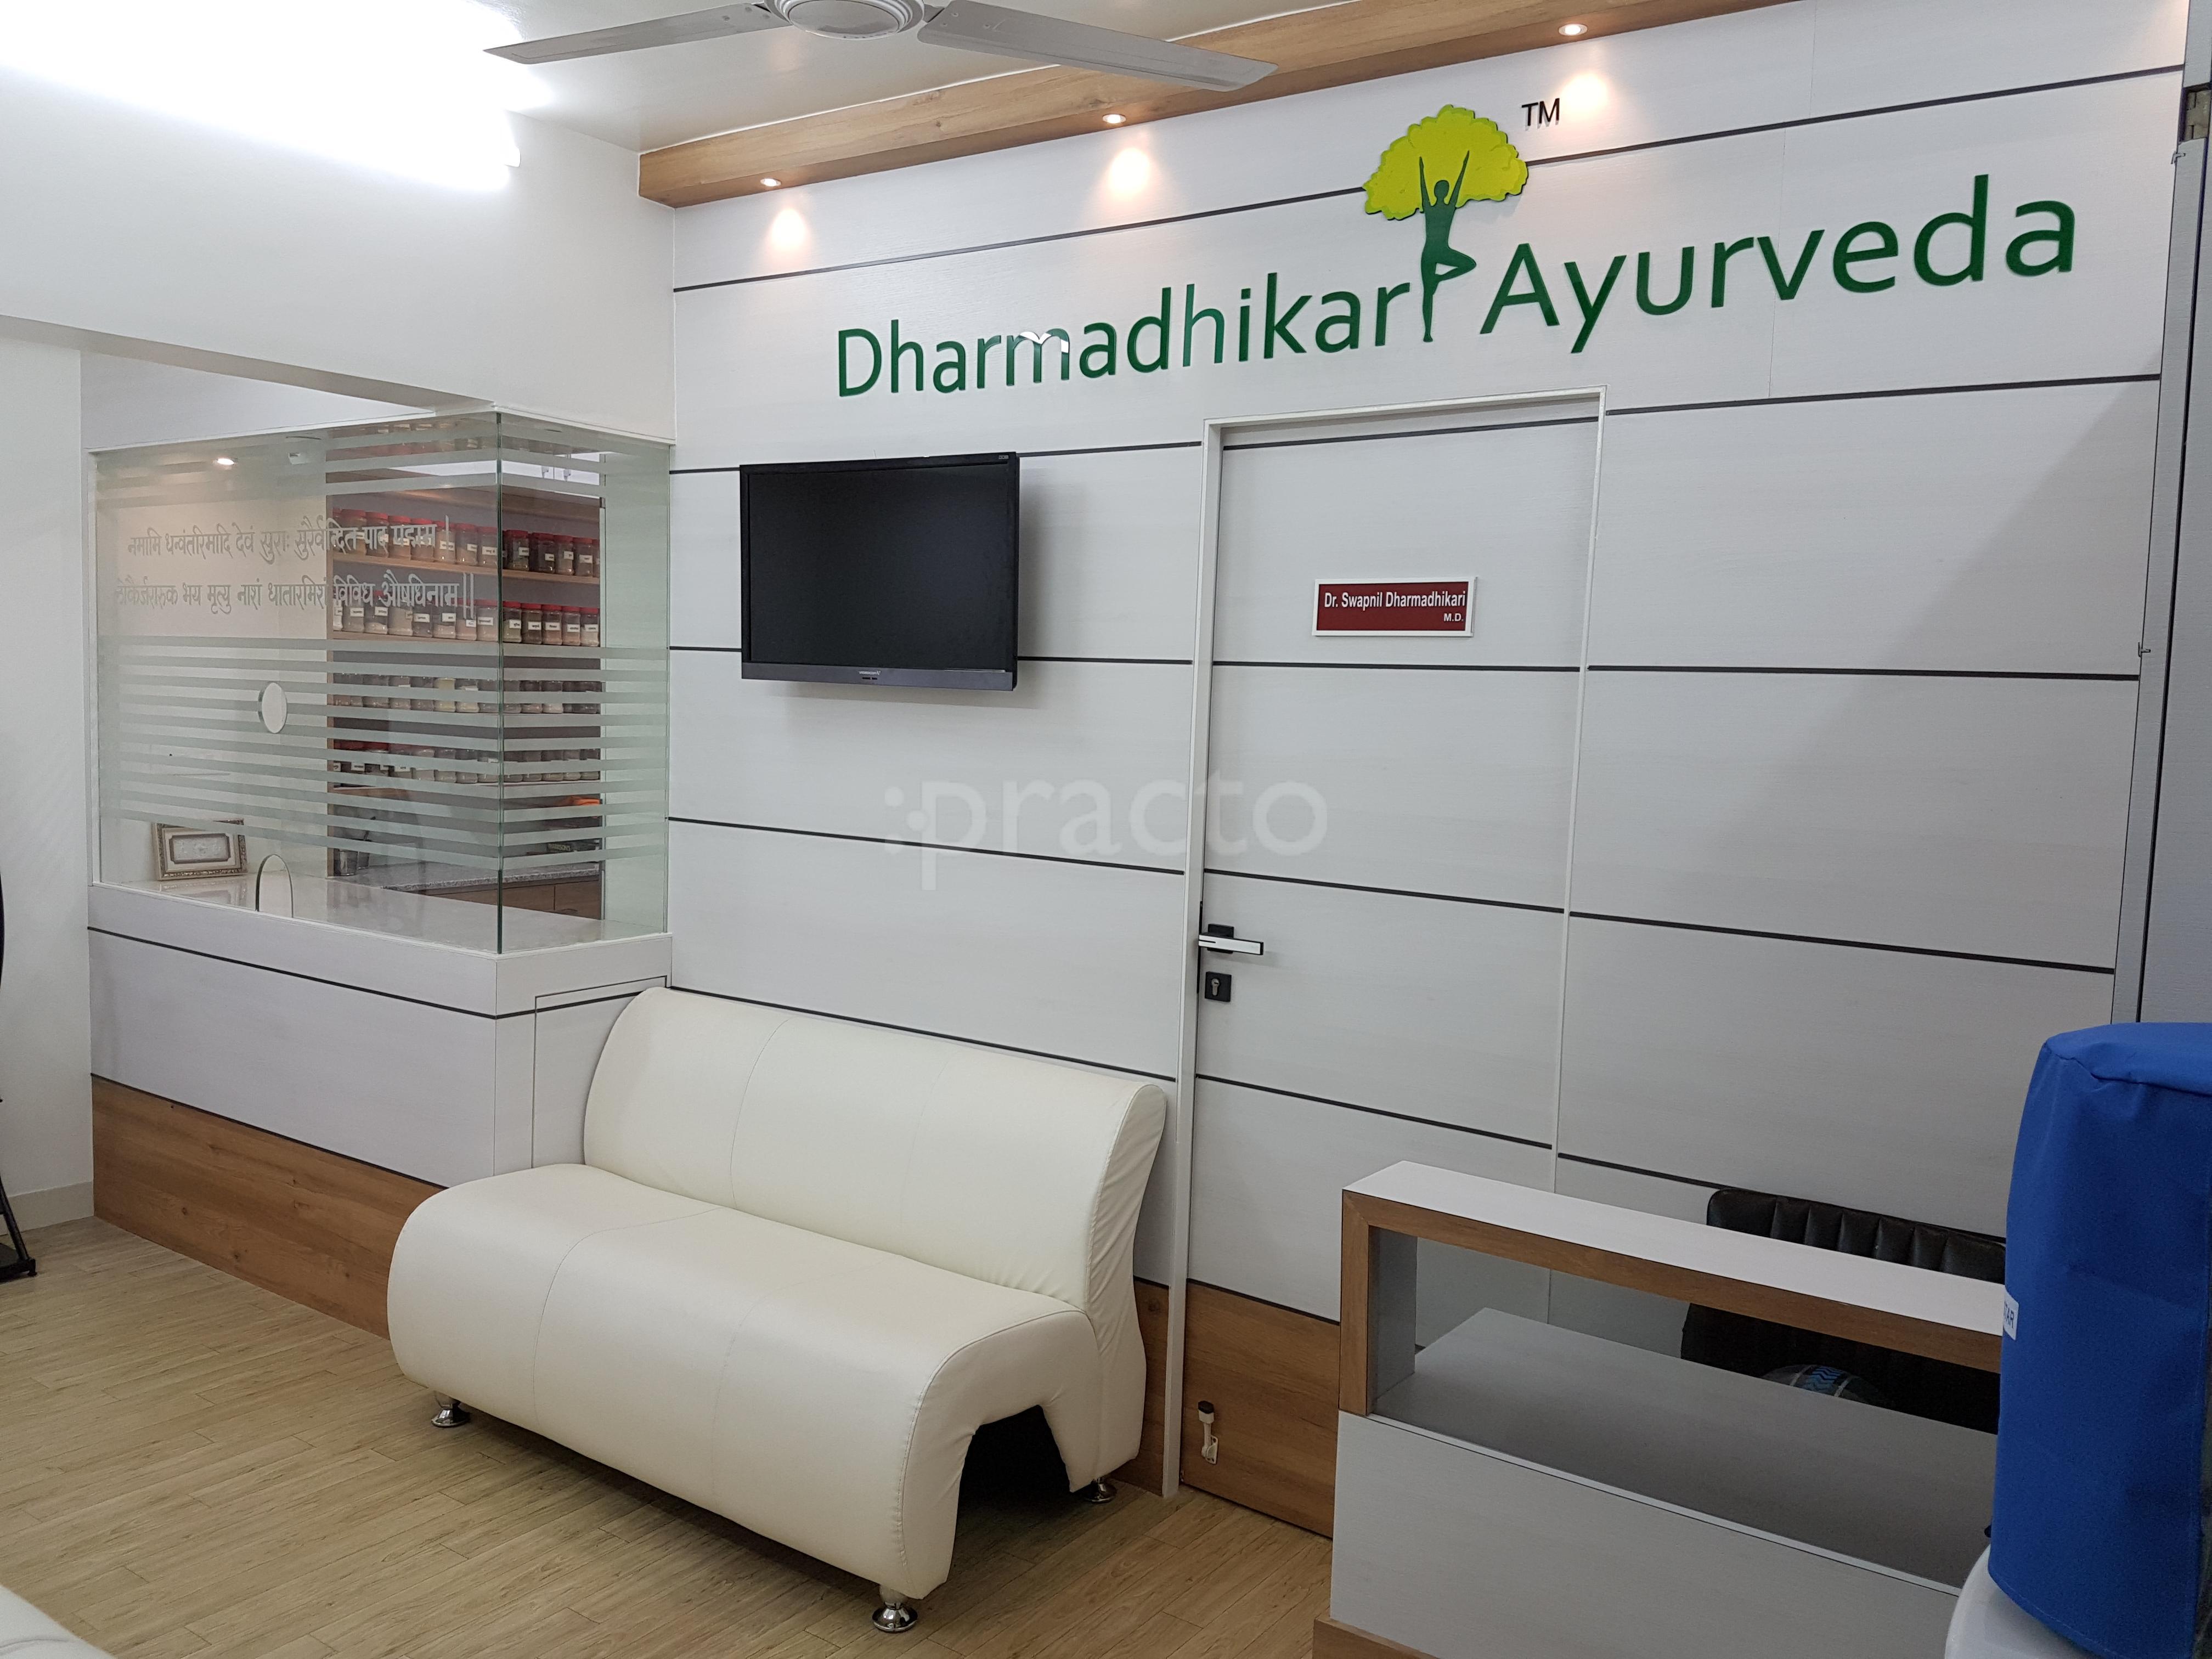 Dharmadhikari Ayurveda Clinic Research Center Ayurveda Clinic In Borivali West Mumbai Book Appointment View Fees Feedbacks Practo